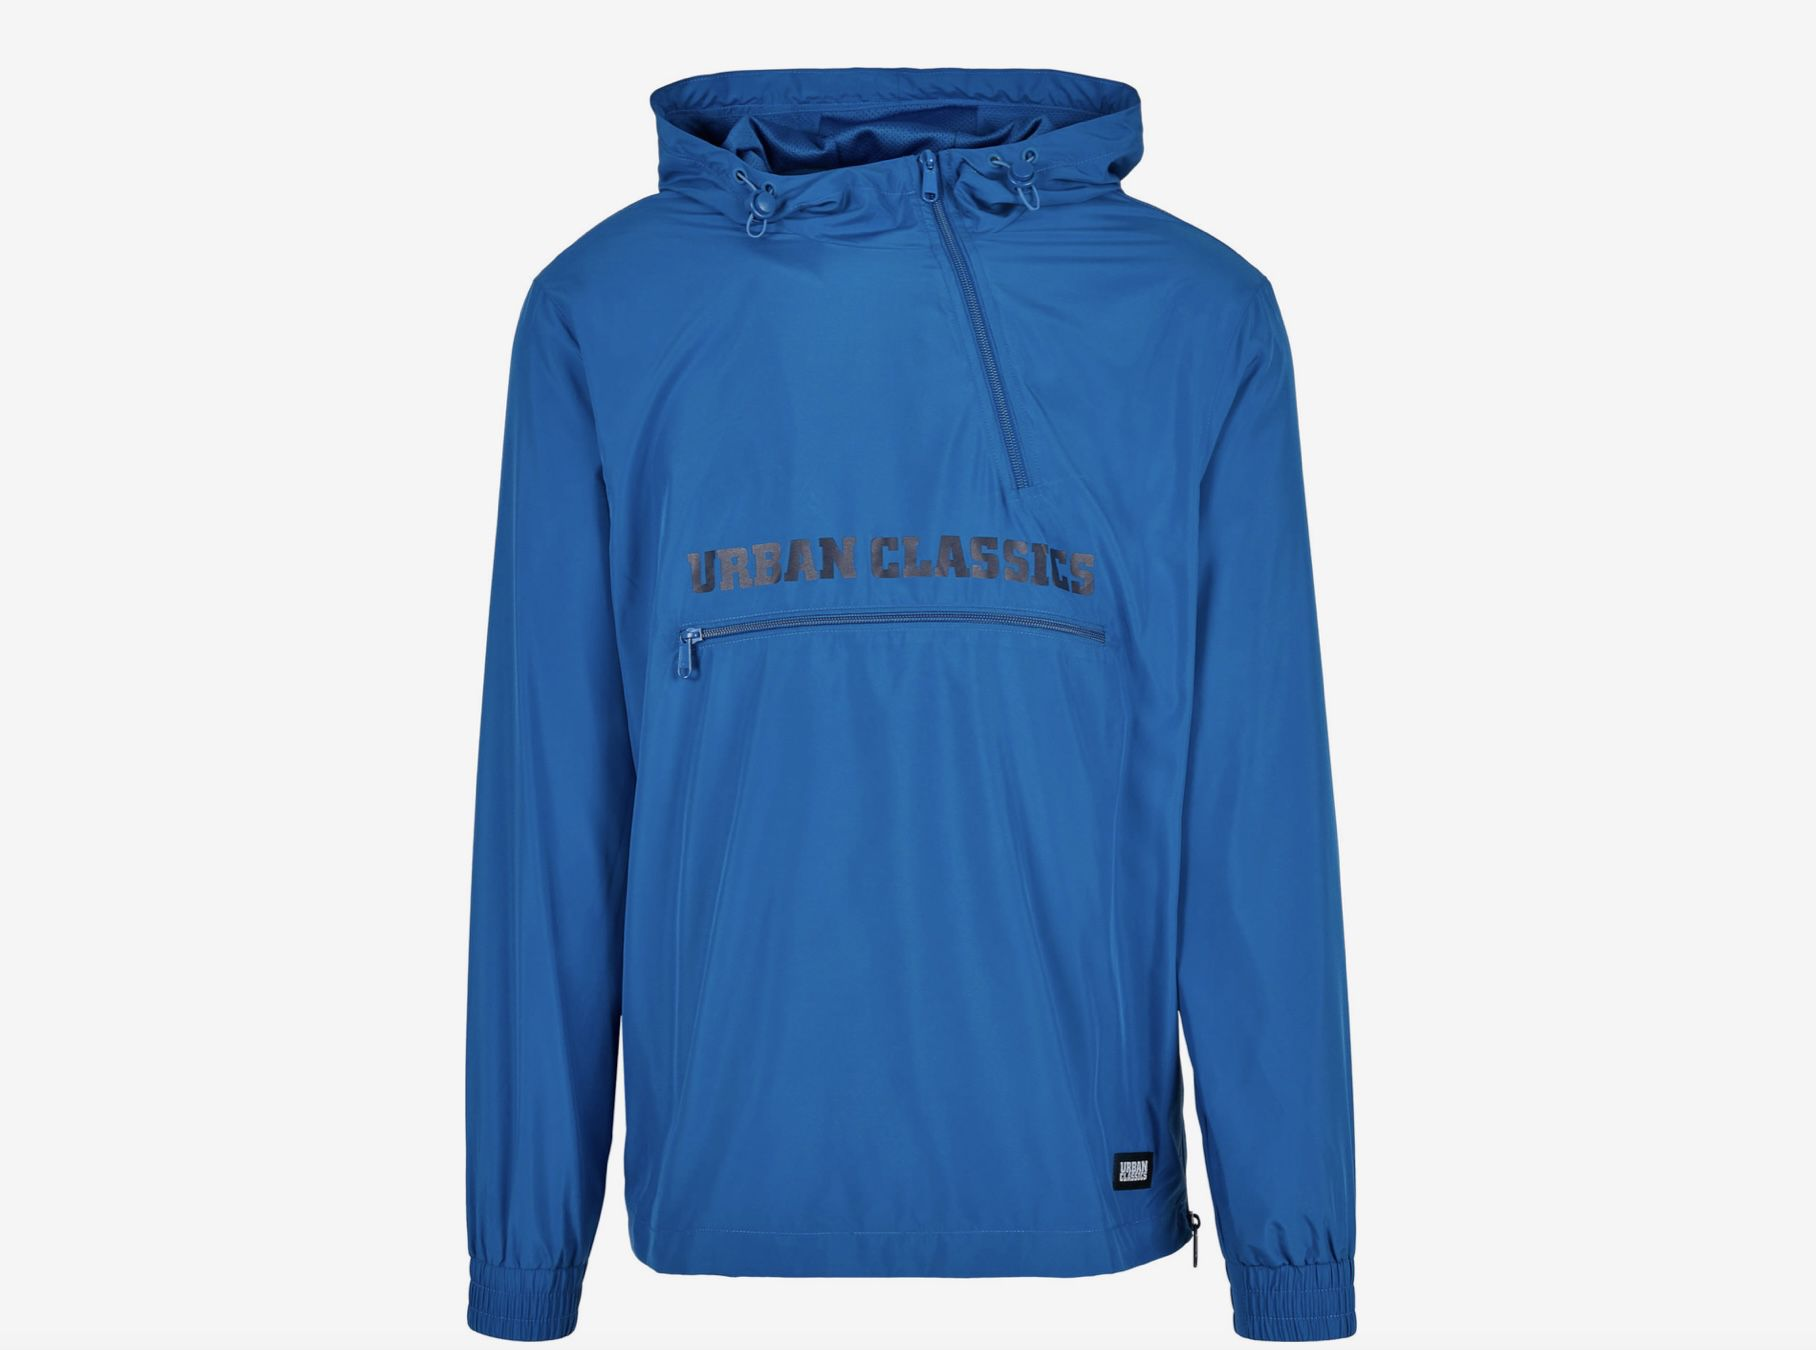 Urban Classics Herren-Jacke 'Commuter' in Blau für 29,67€ (statt 40€)